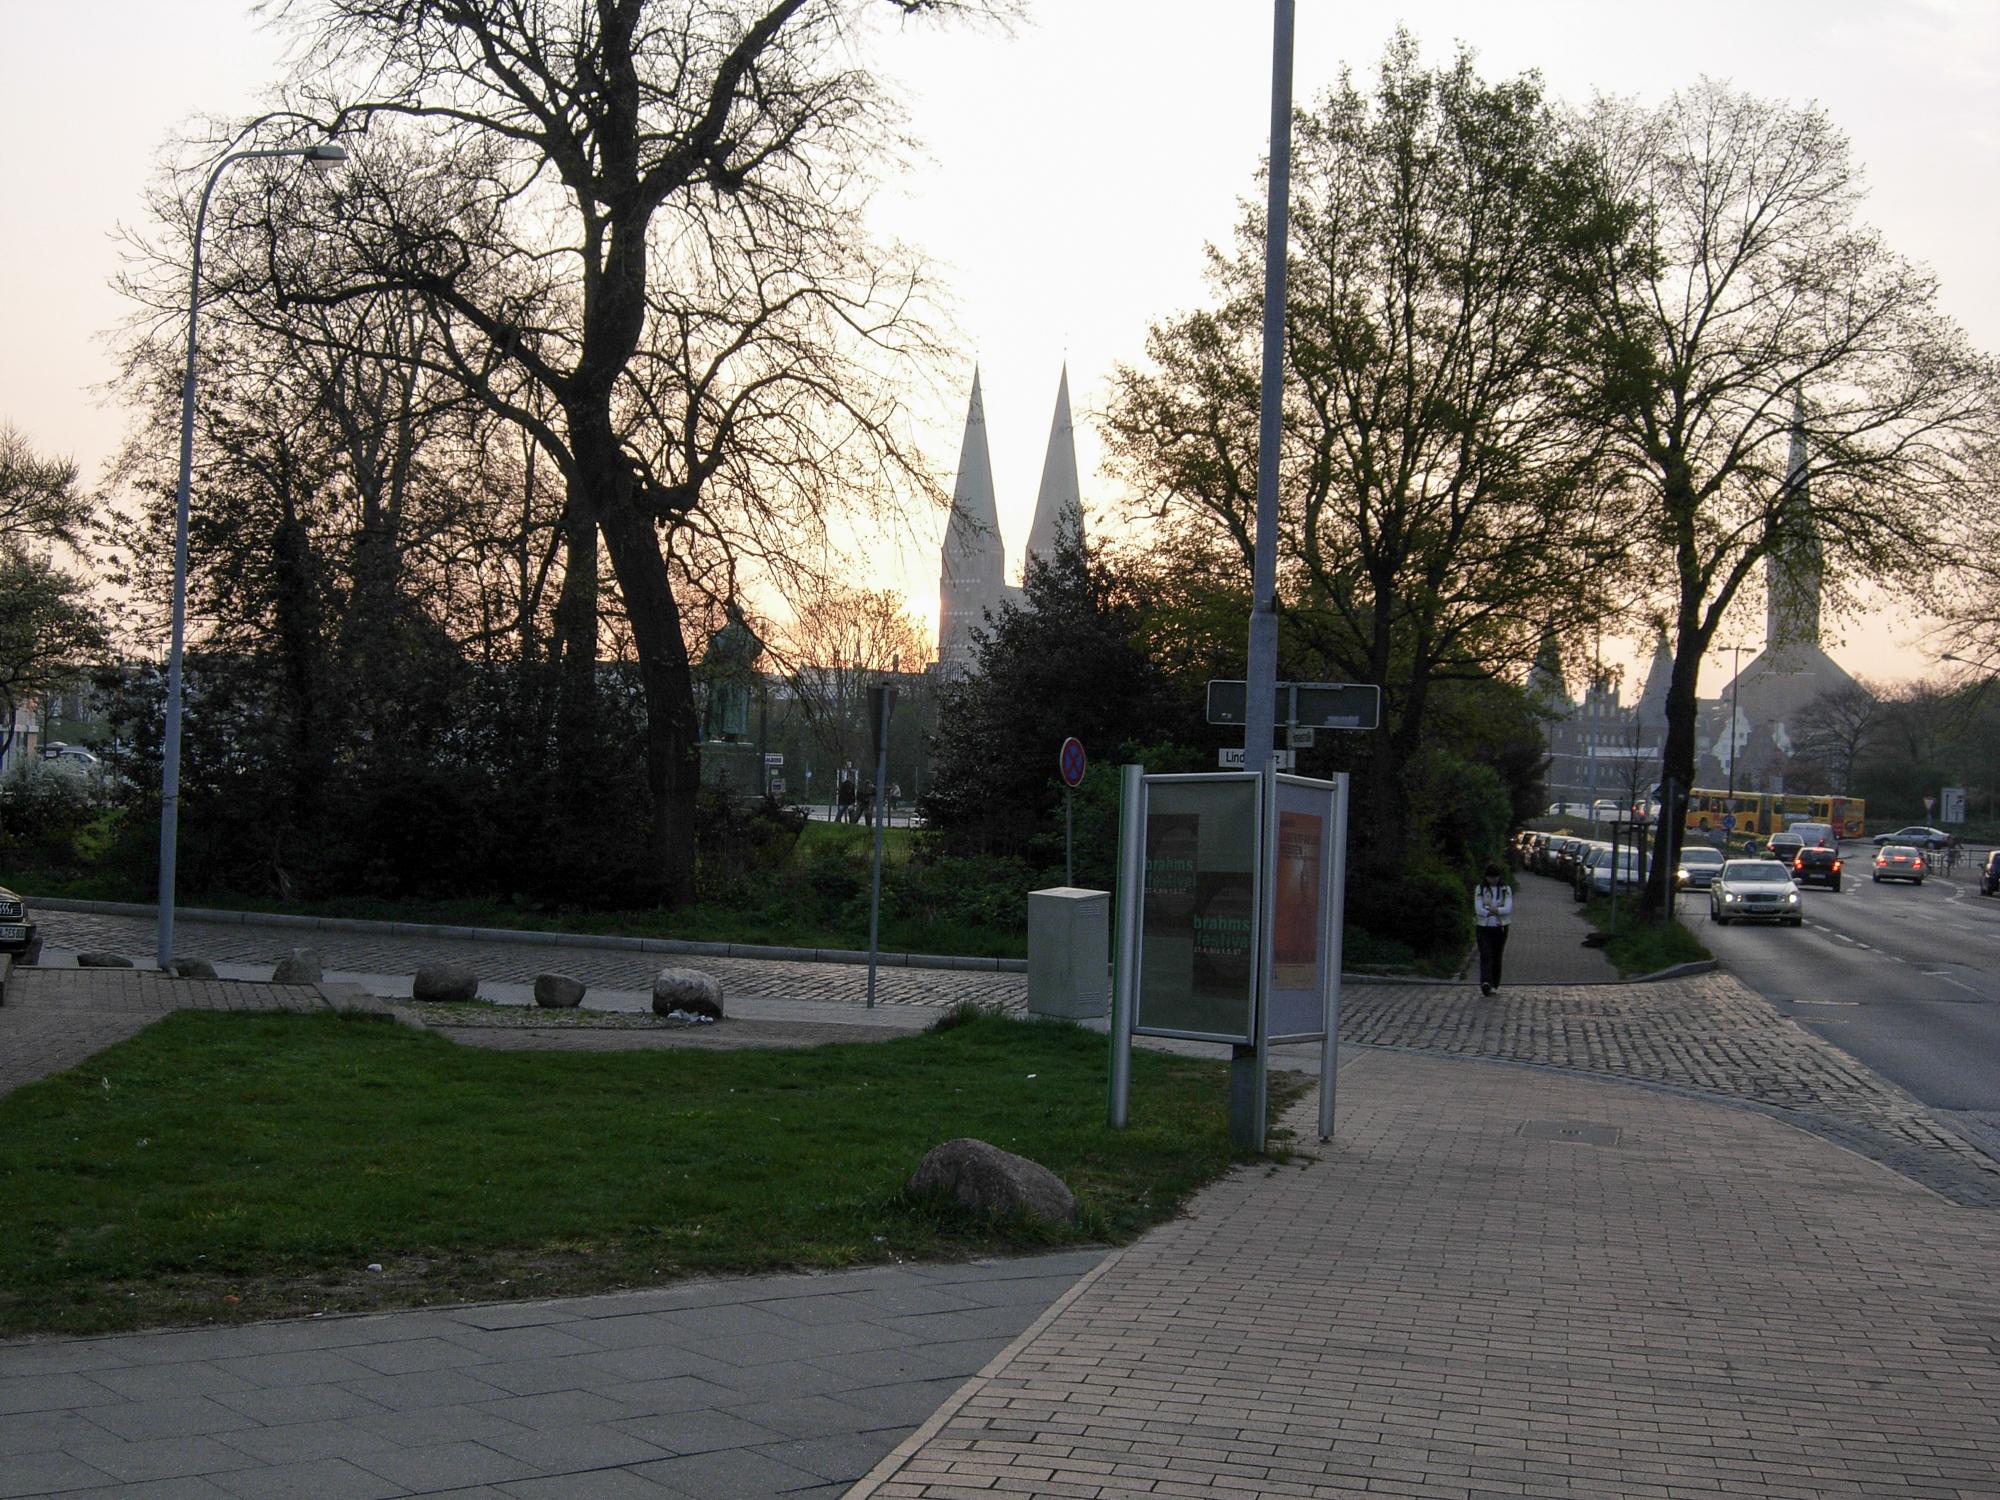 Lübeck dawn